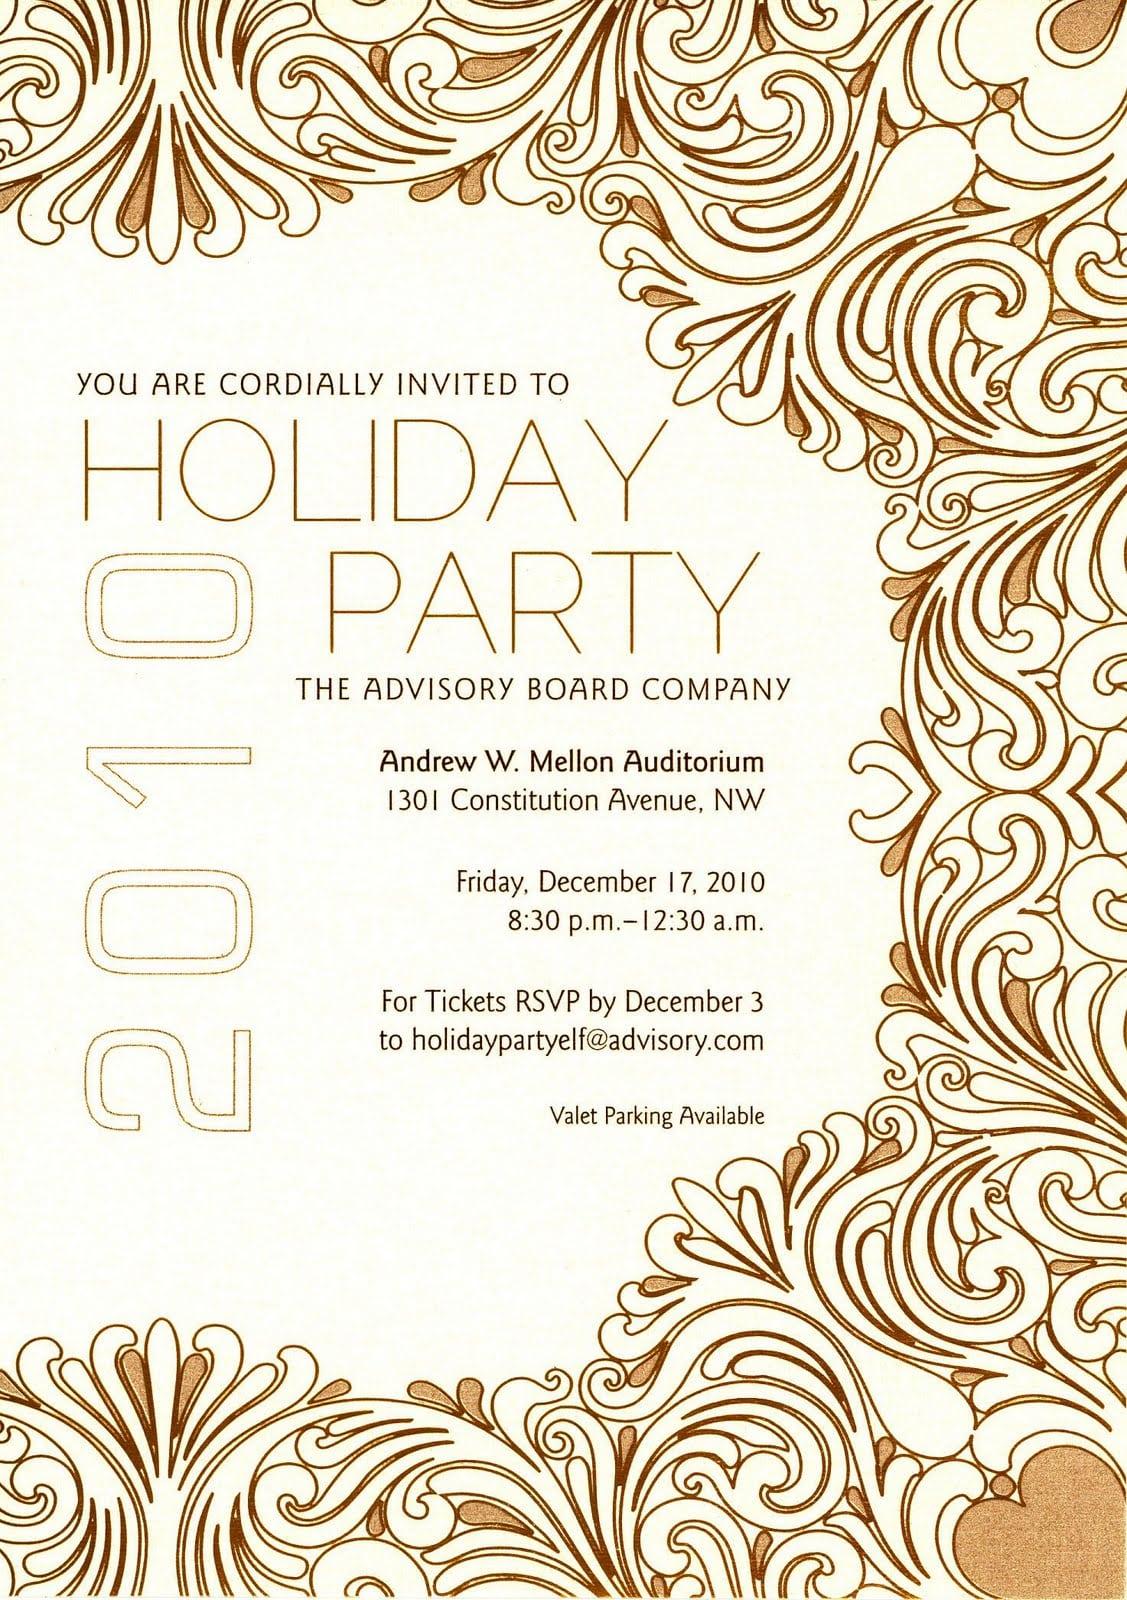 Corporate Holiday Invitation Wording Theminecraftserver Best